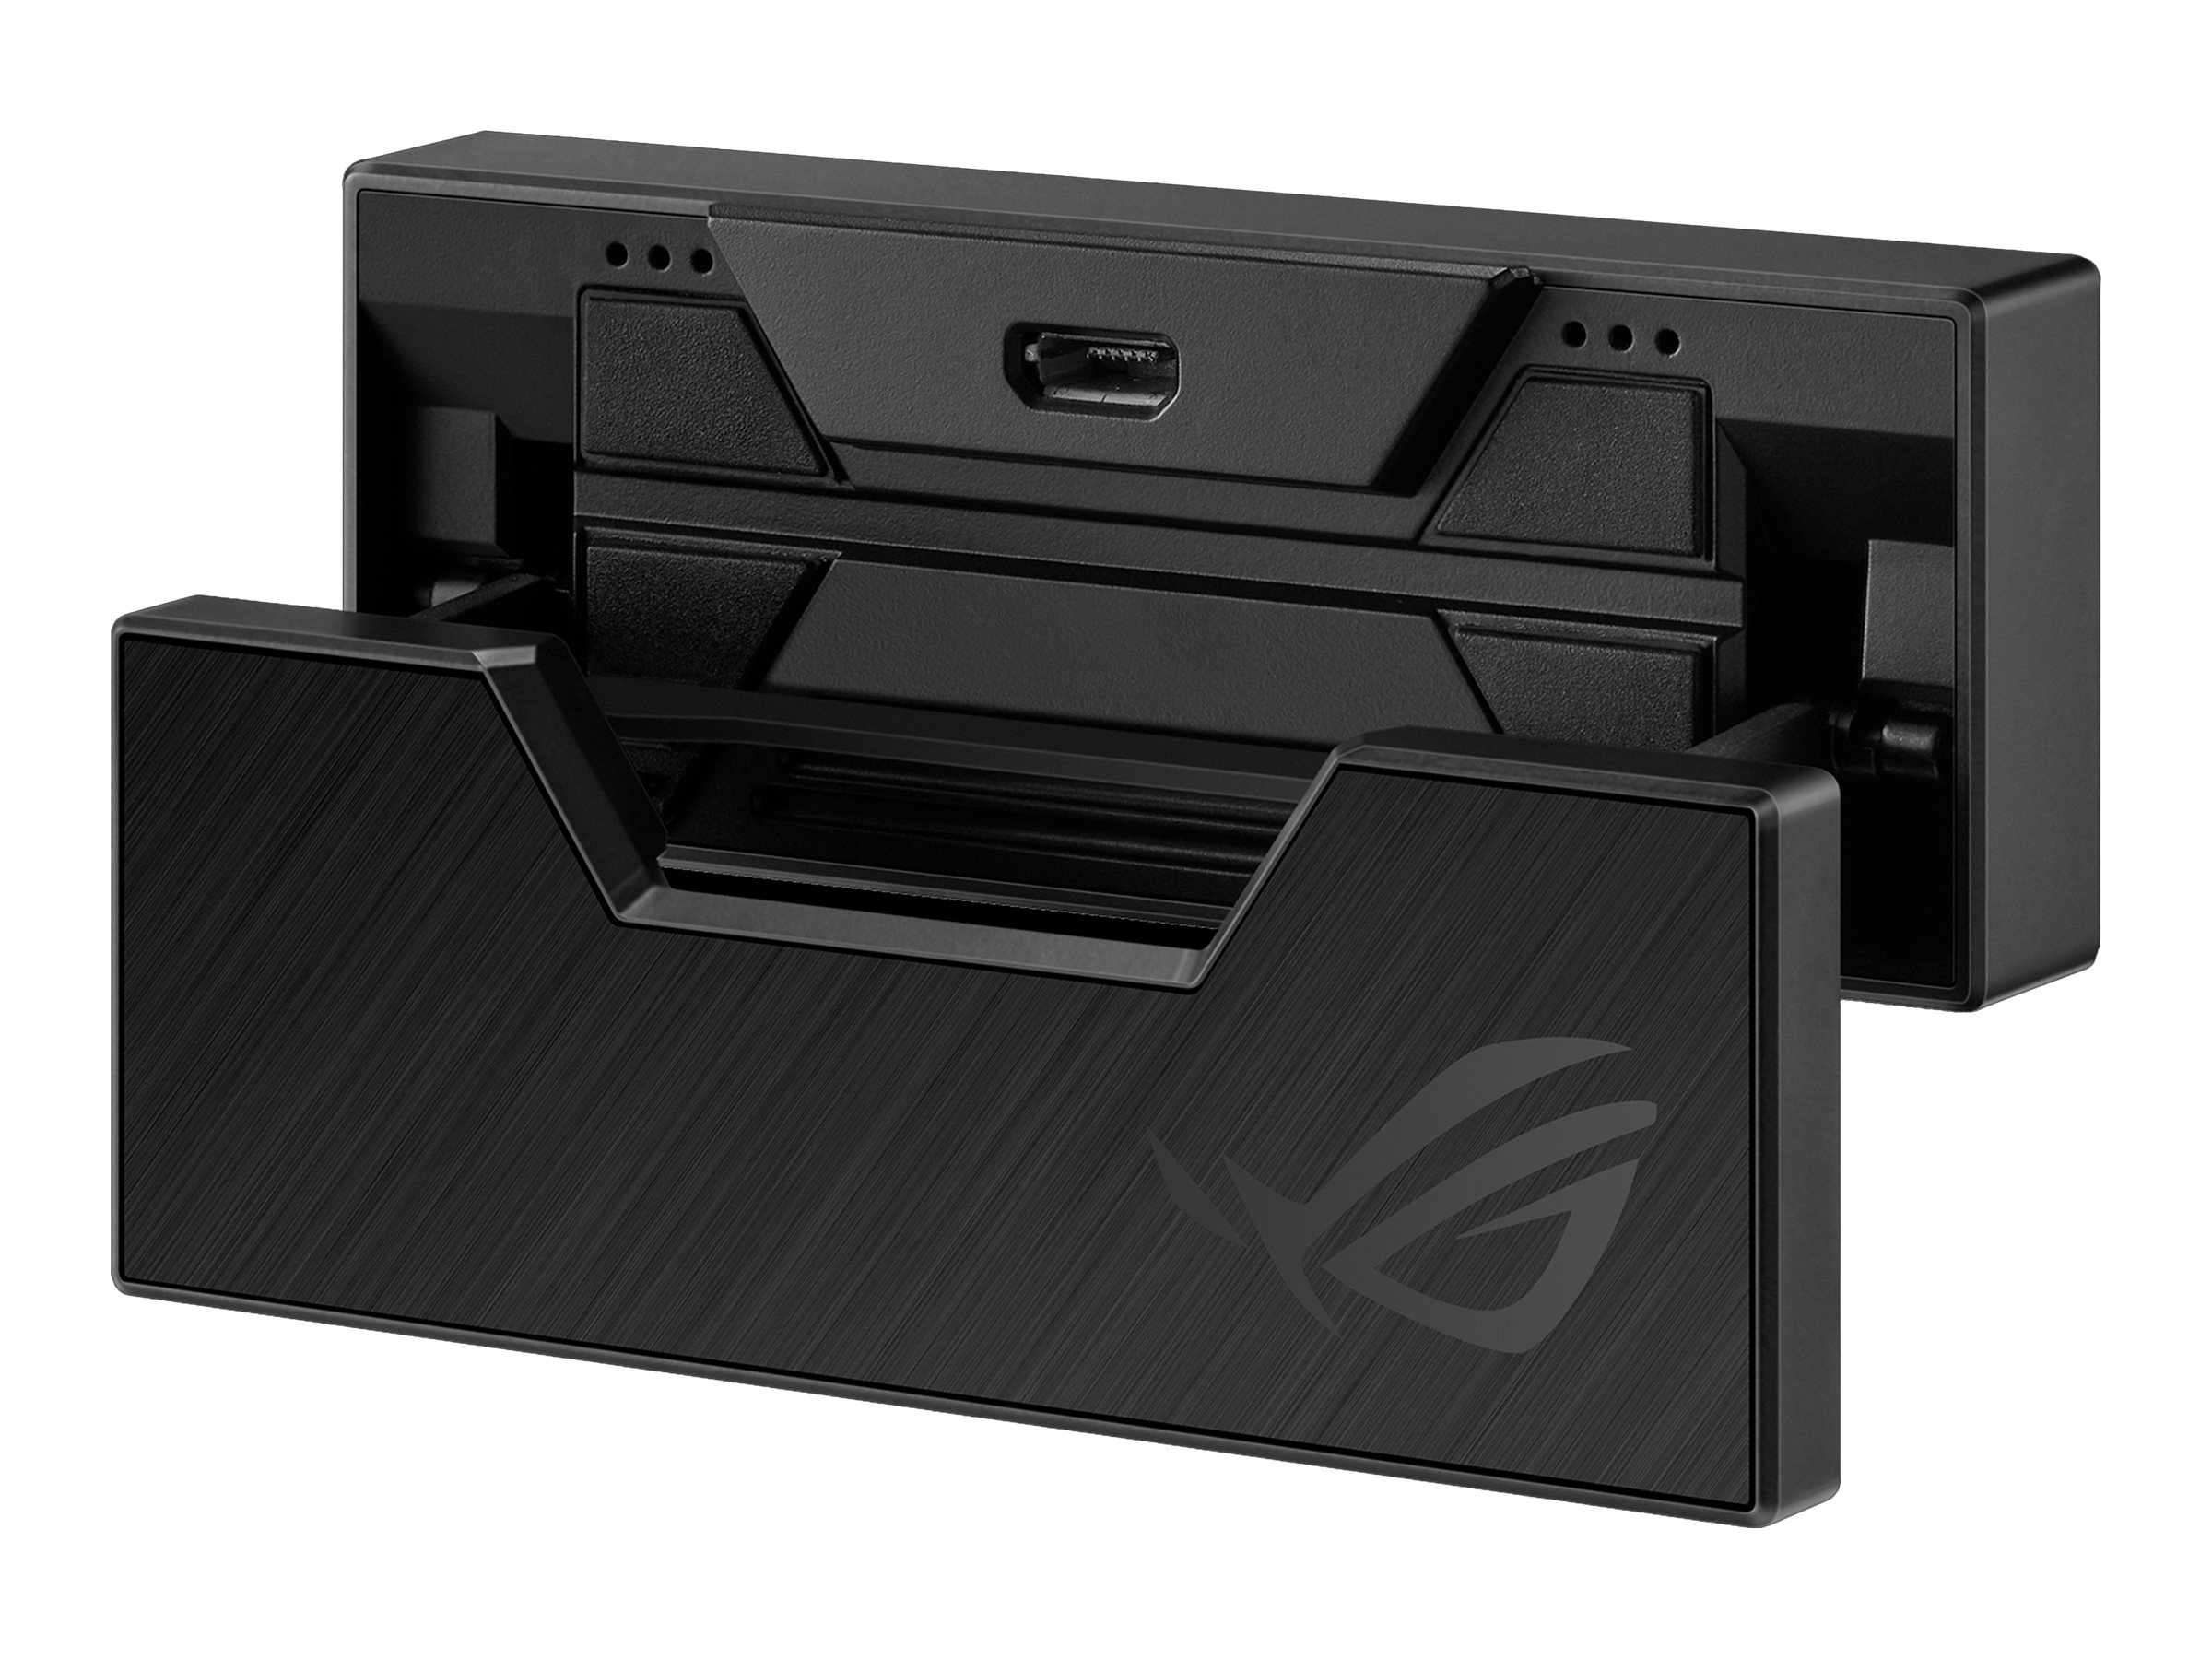 ASUS ROG Eye - Web-Kamera - Farbe - 1920 x 1080 - Audio - USB